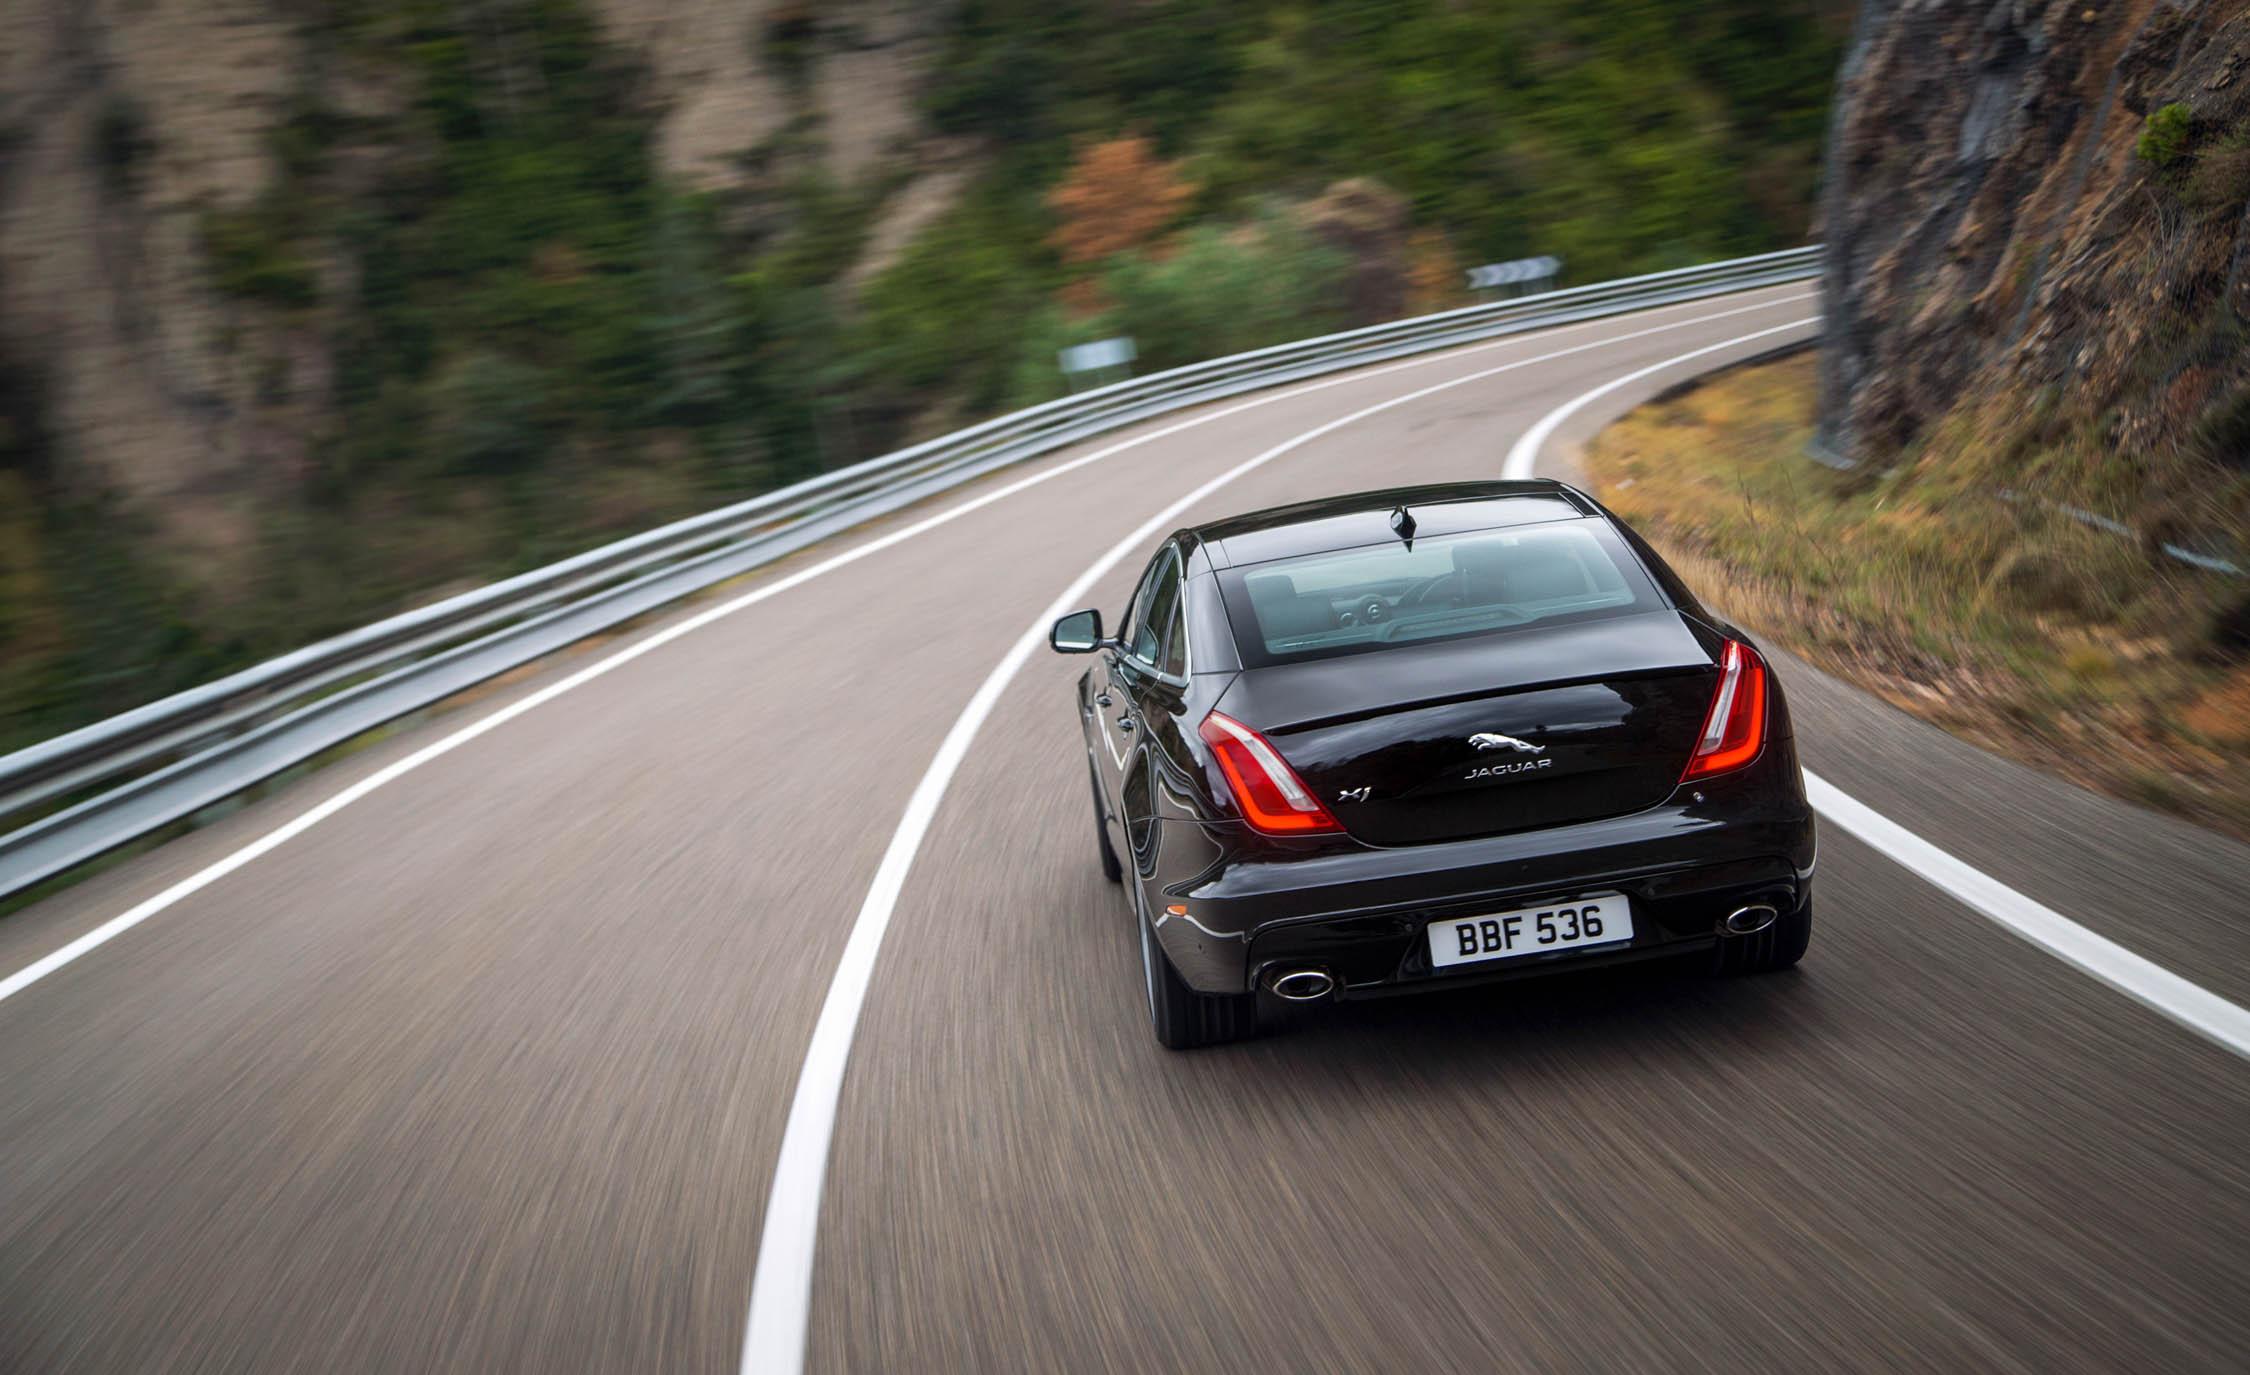 2016 Jaguar XJ Rear View